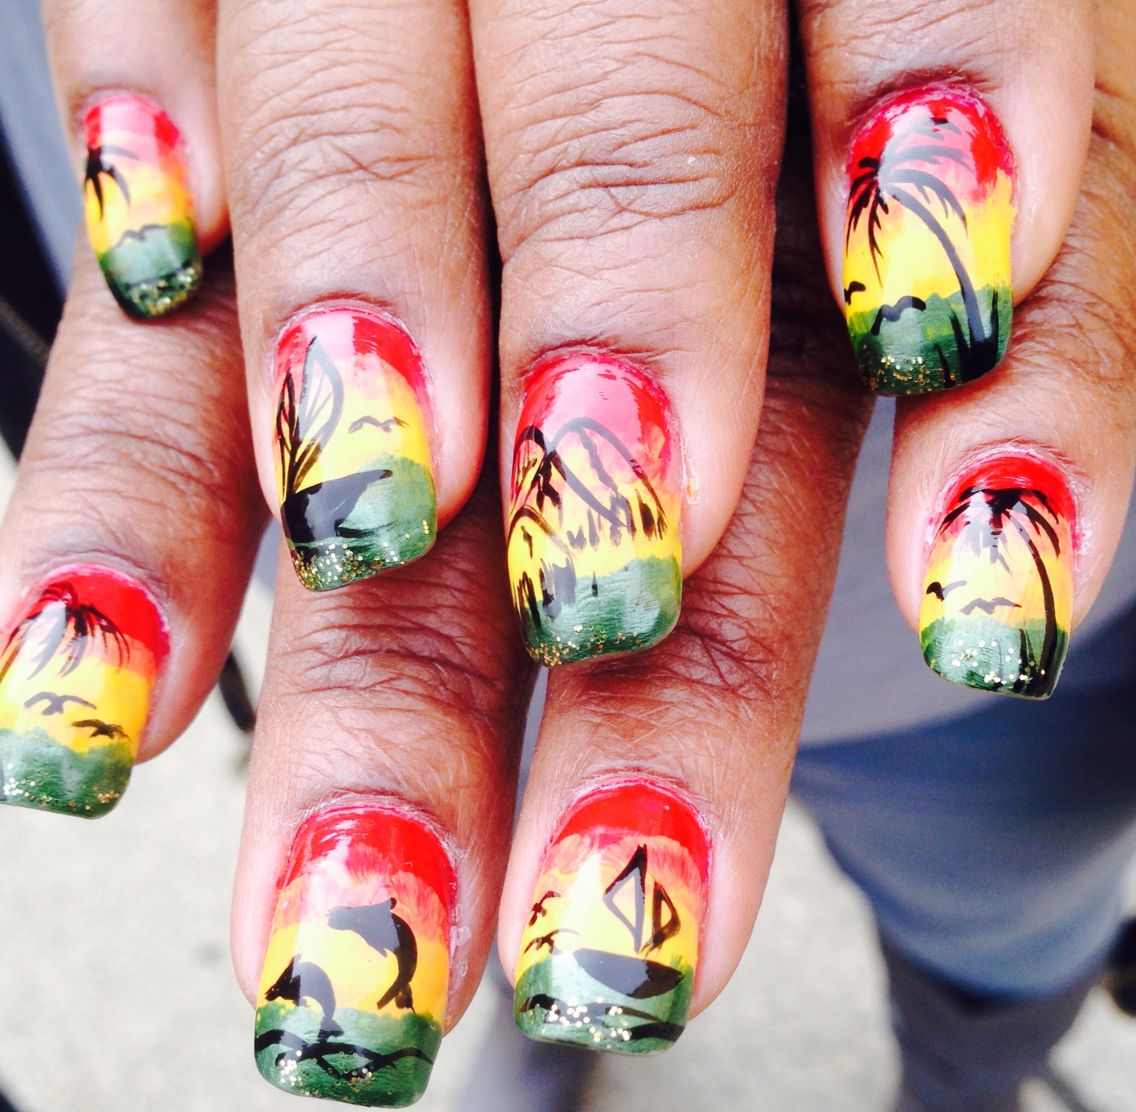 Jamaican Nail Art | travel | Pinterest | Jamaica nails, Rasta nails ...